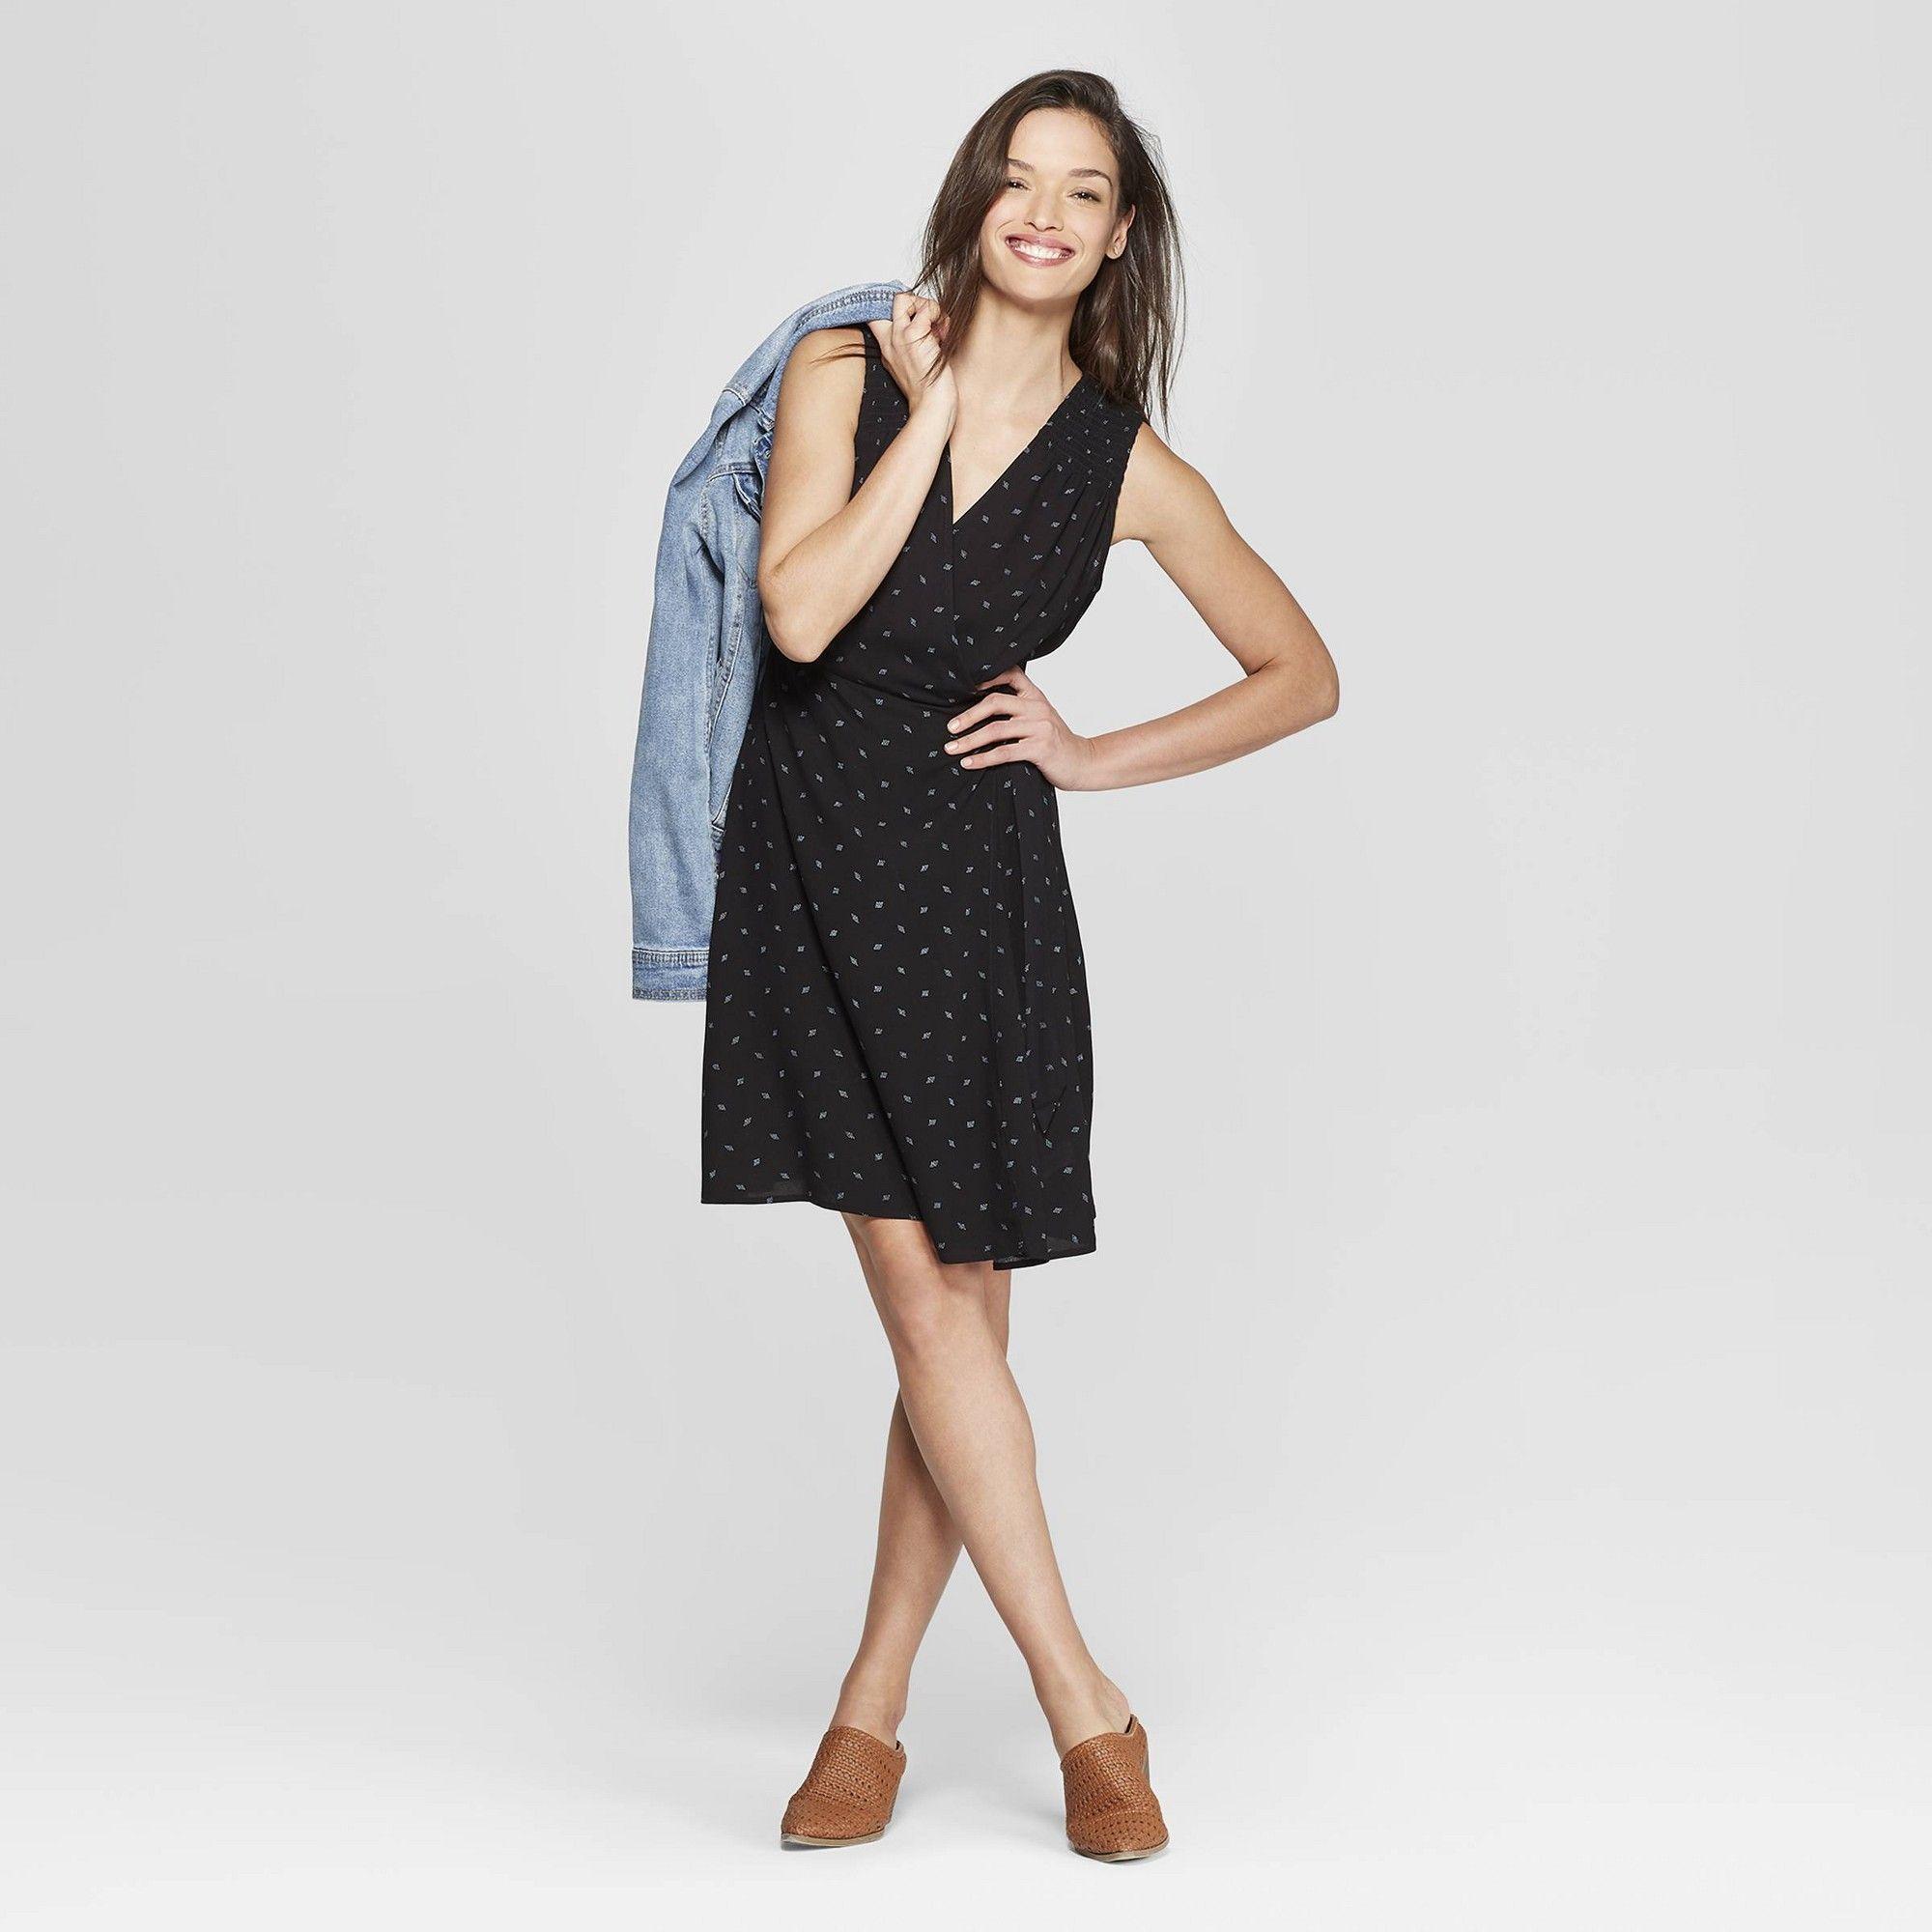 a65851f8d99 Women s Floral Print Sleeveless V-Neck Mini Print Dress - Universal Thread  Black Xxl